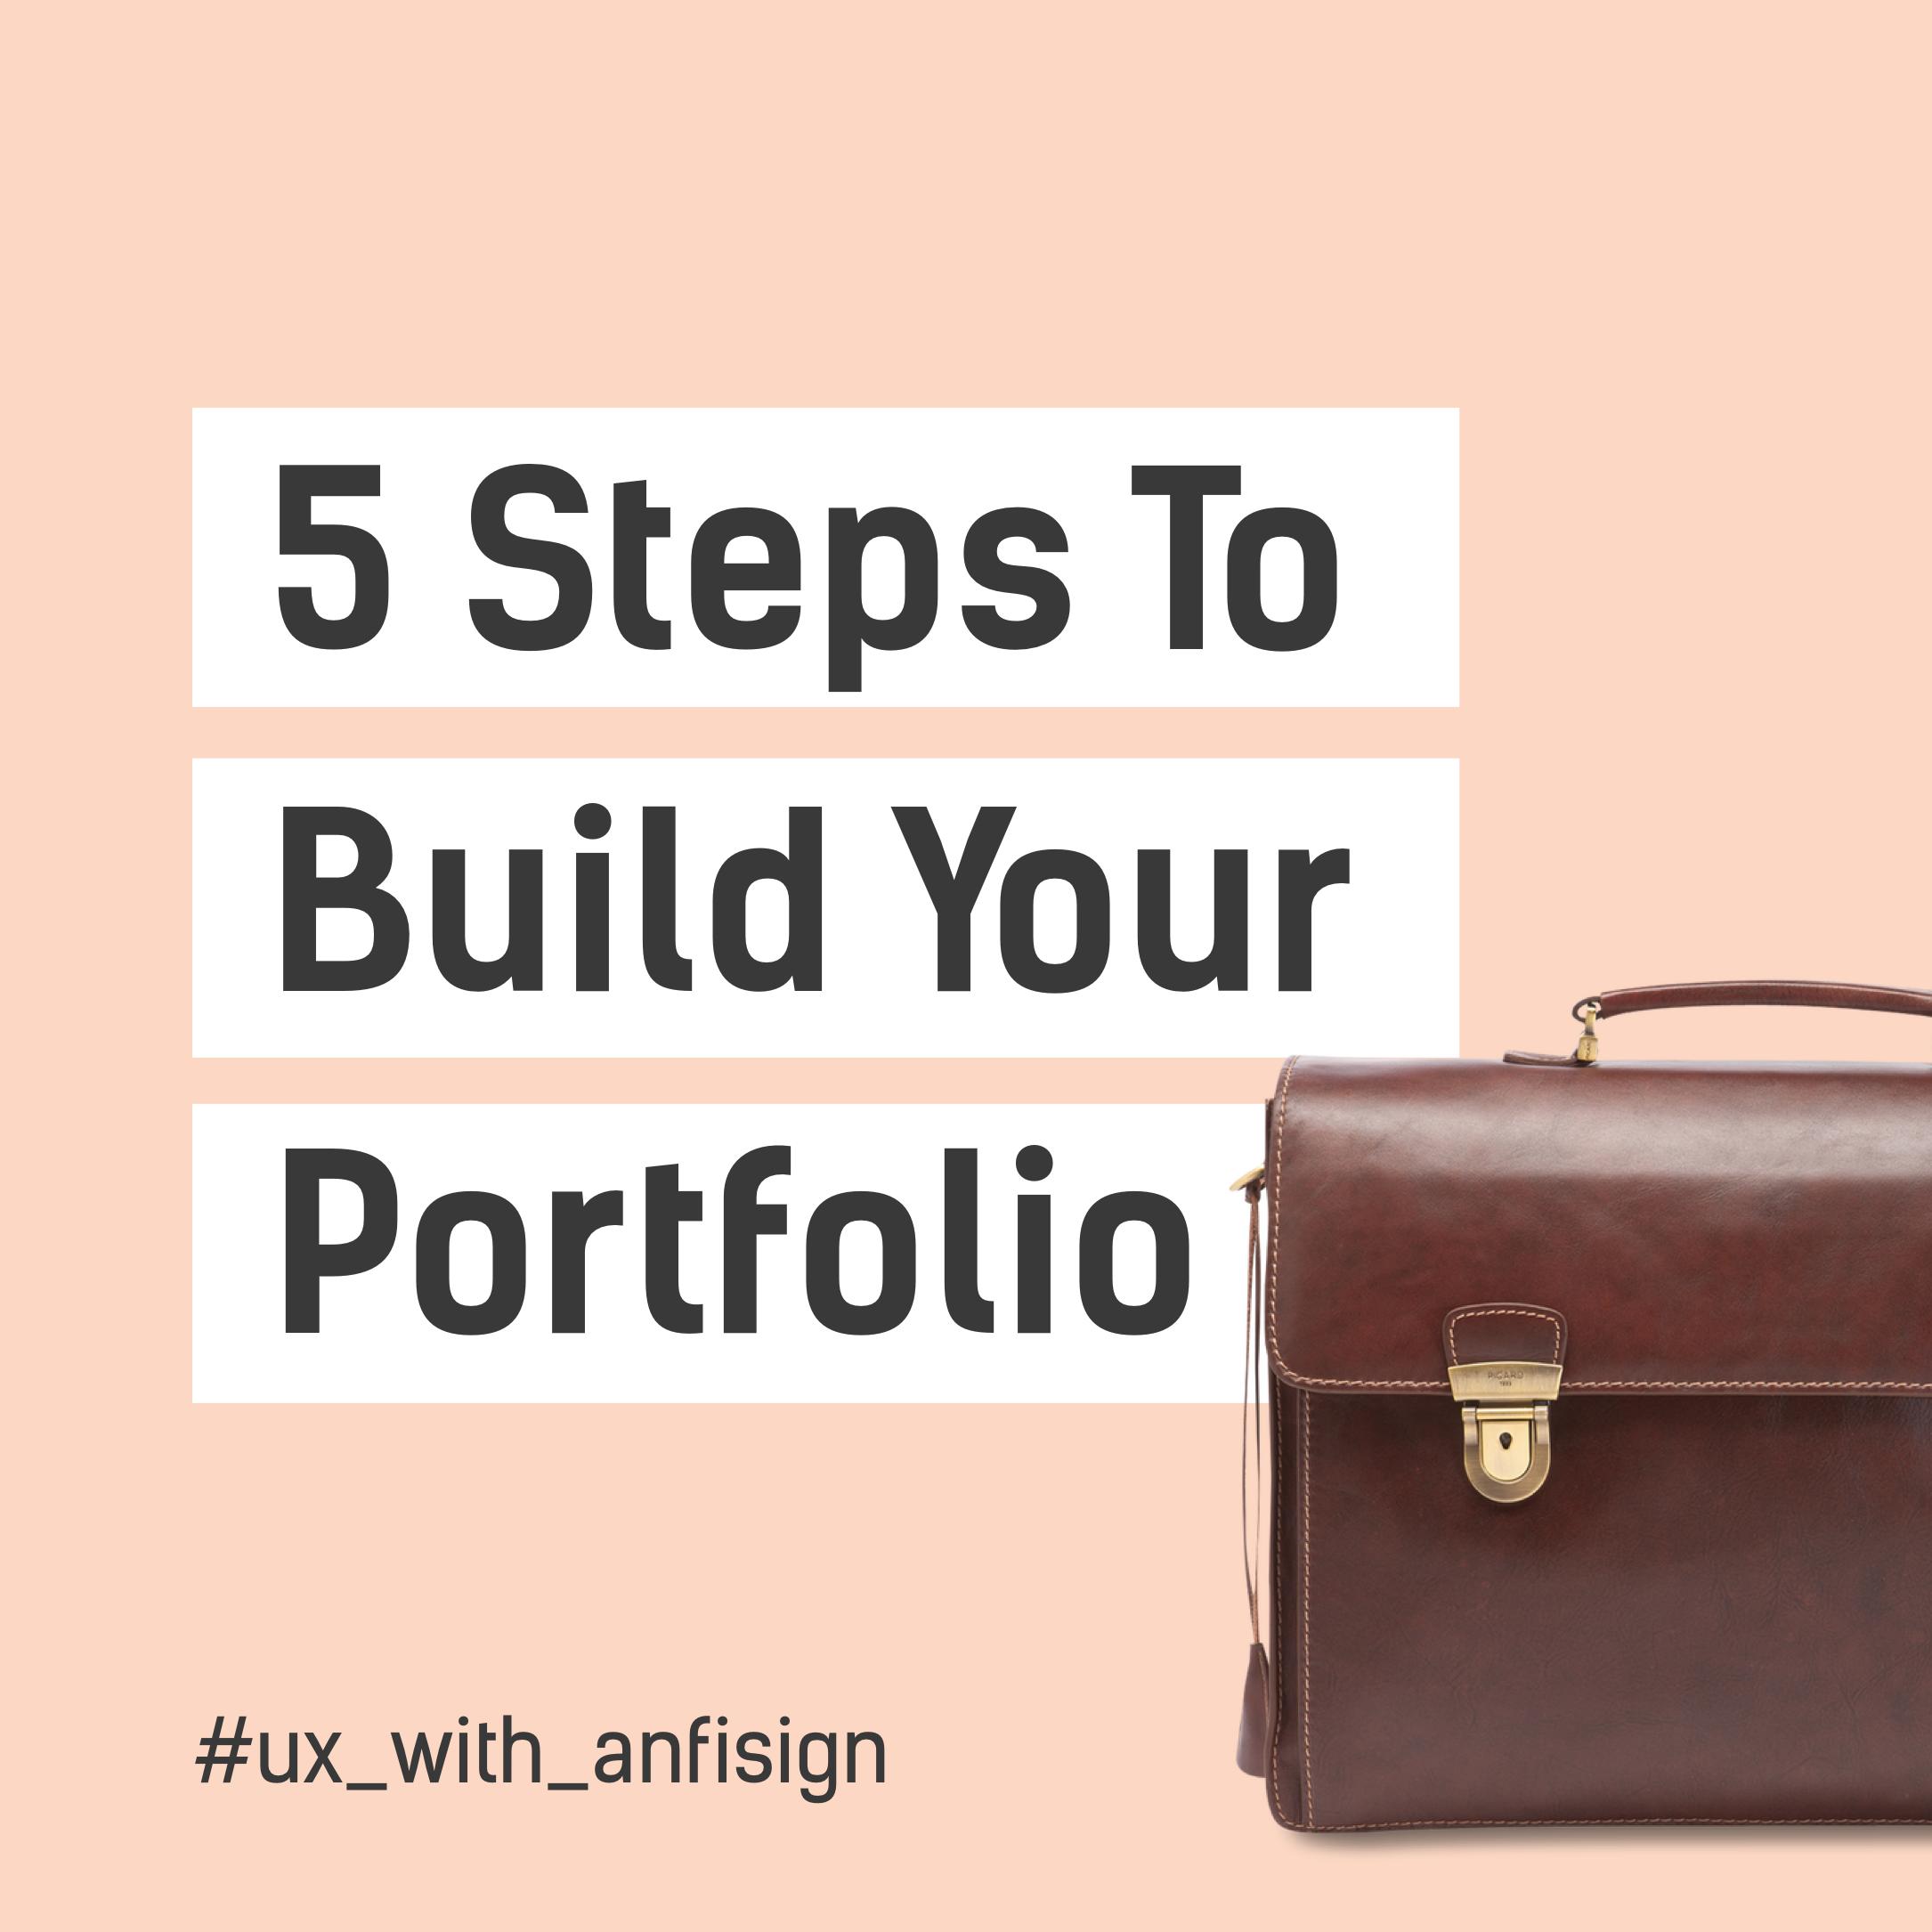 5 tips on how to build portfolio